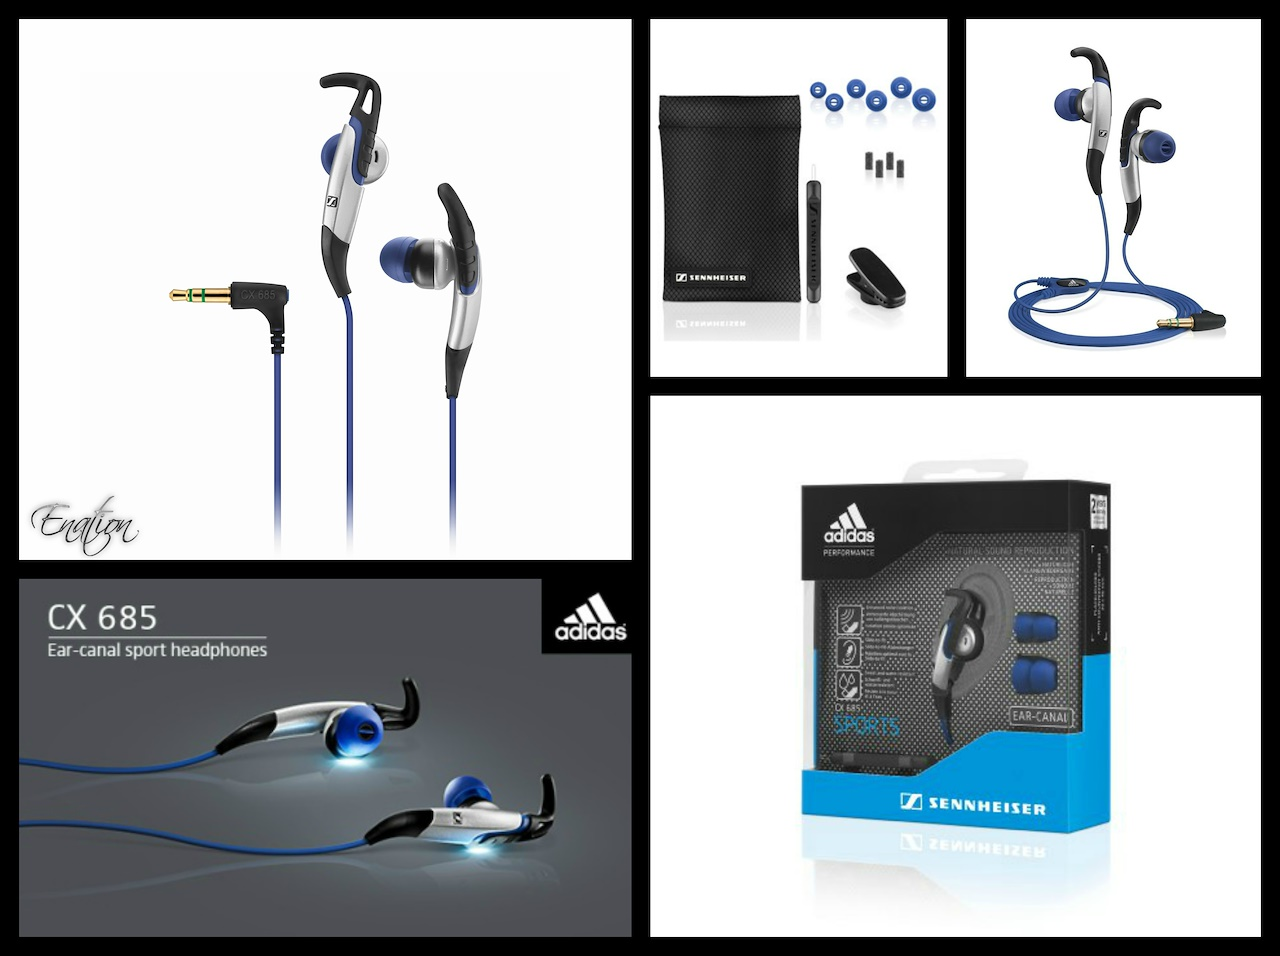 Every Need Want Day Earphone Sennheiser Cx Sport Adidas 685 G